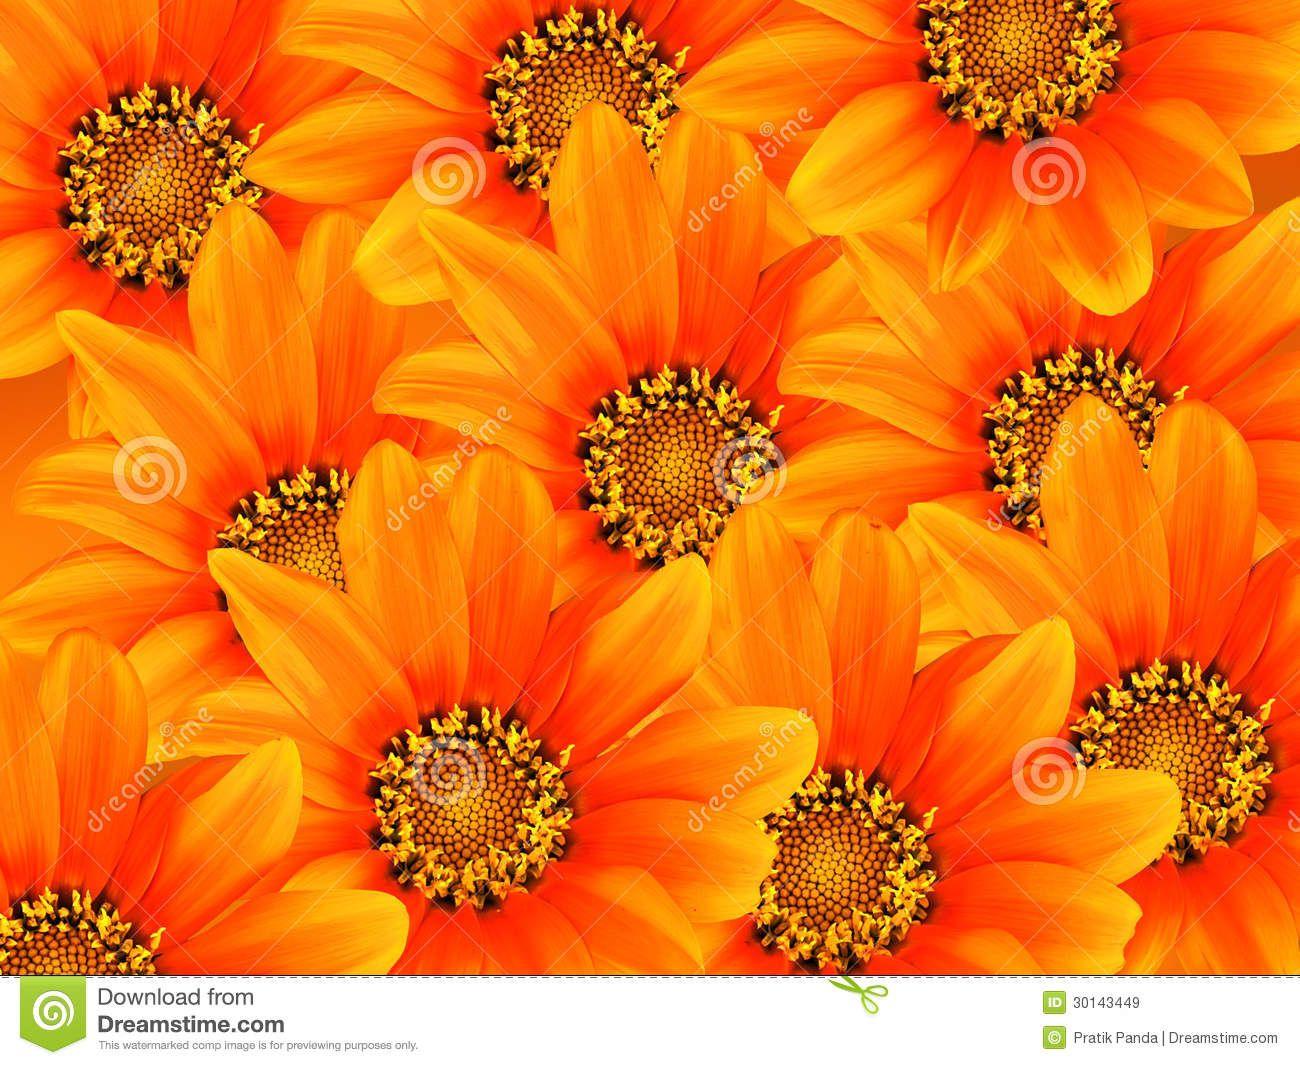 Gerbera Orange Flowers Background Flower Backgrounds Orange Flowers Flower Images